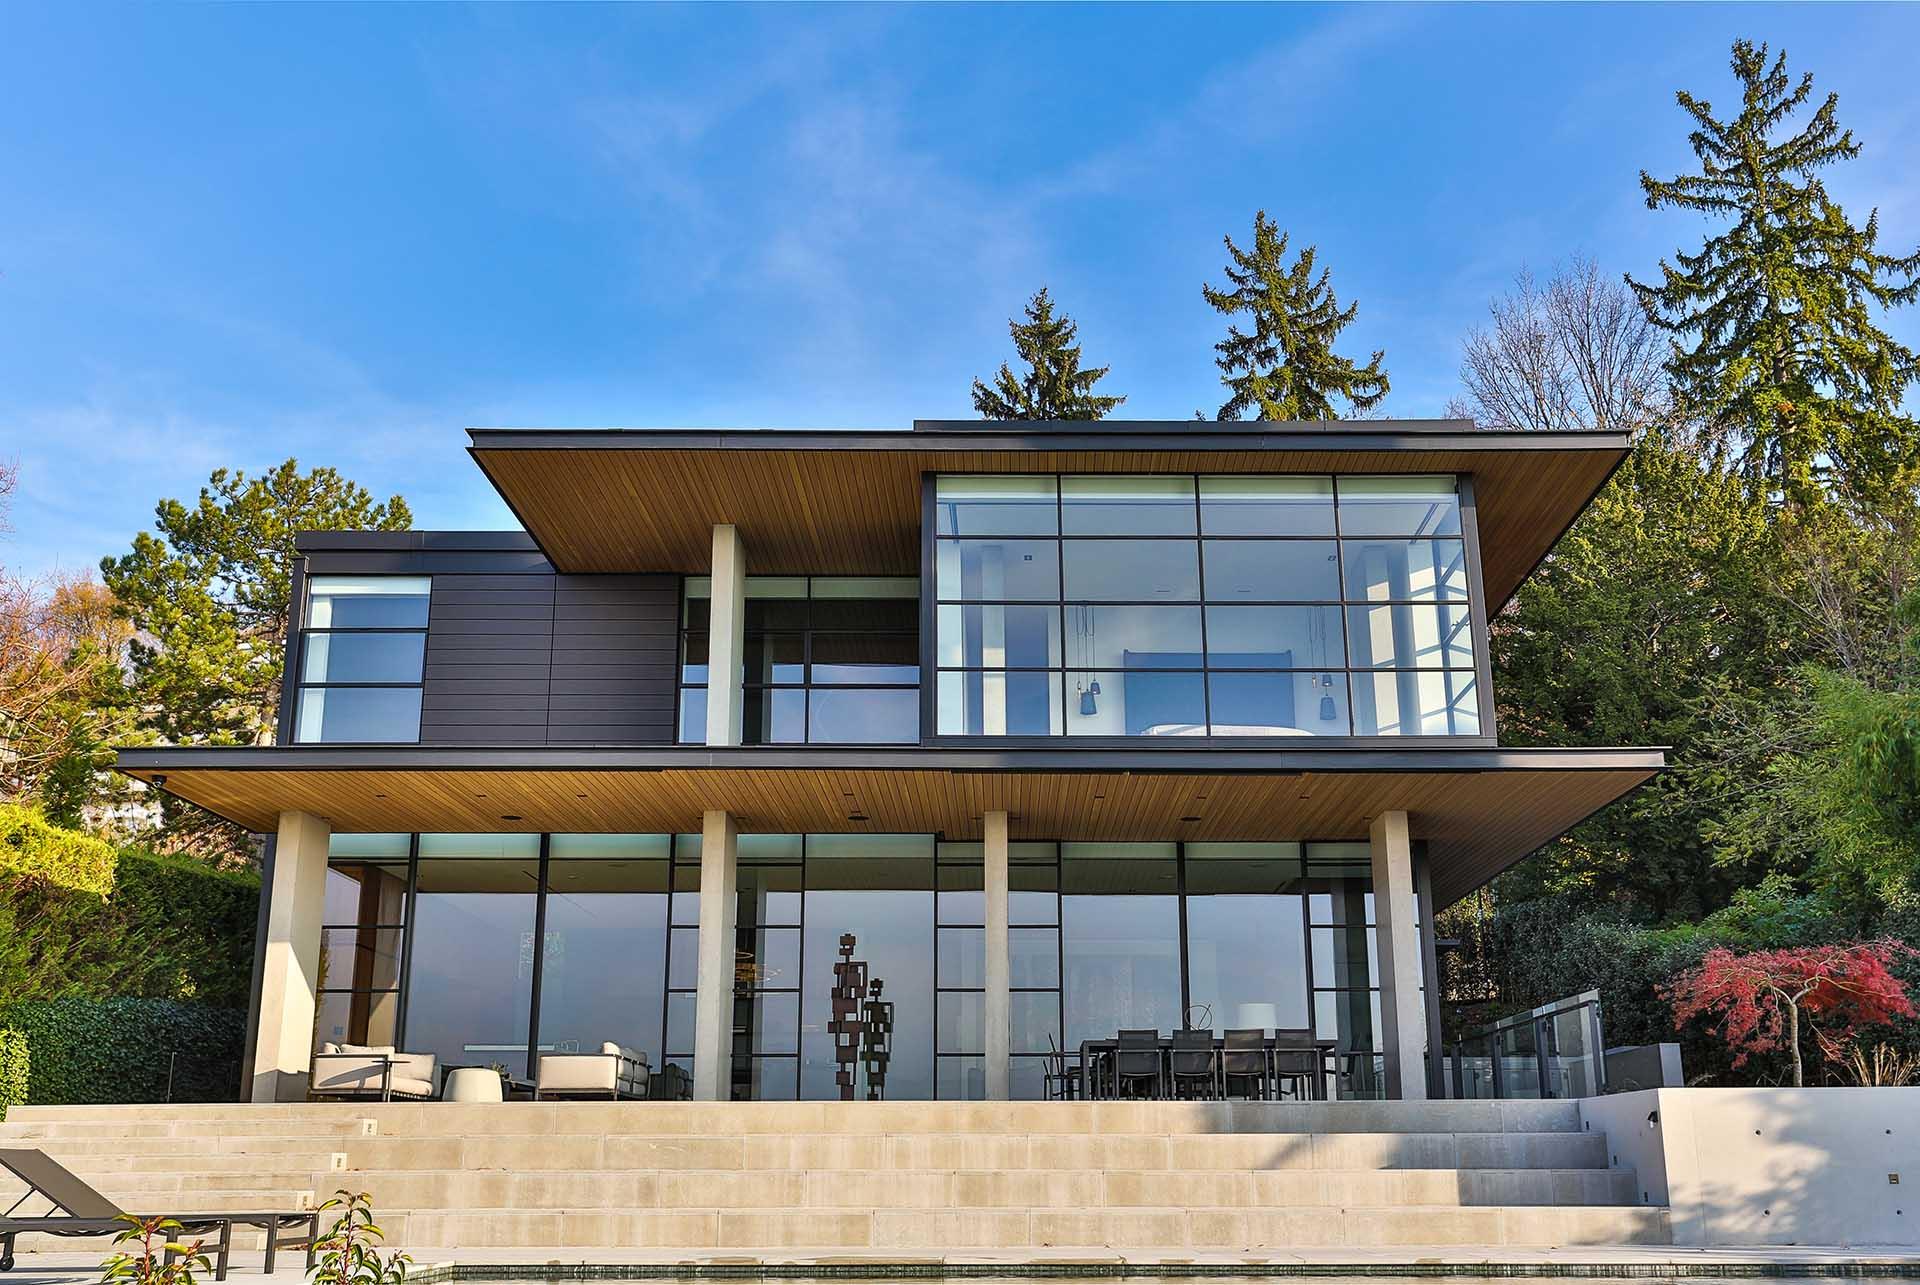 Steel beautiful windows